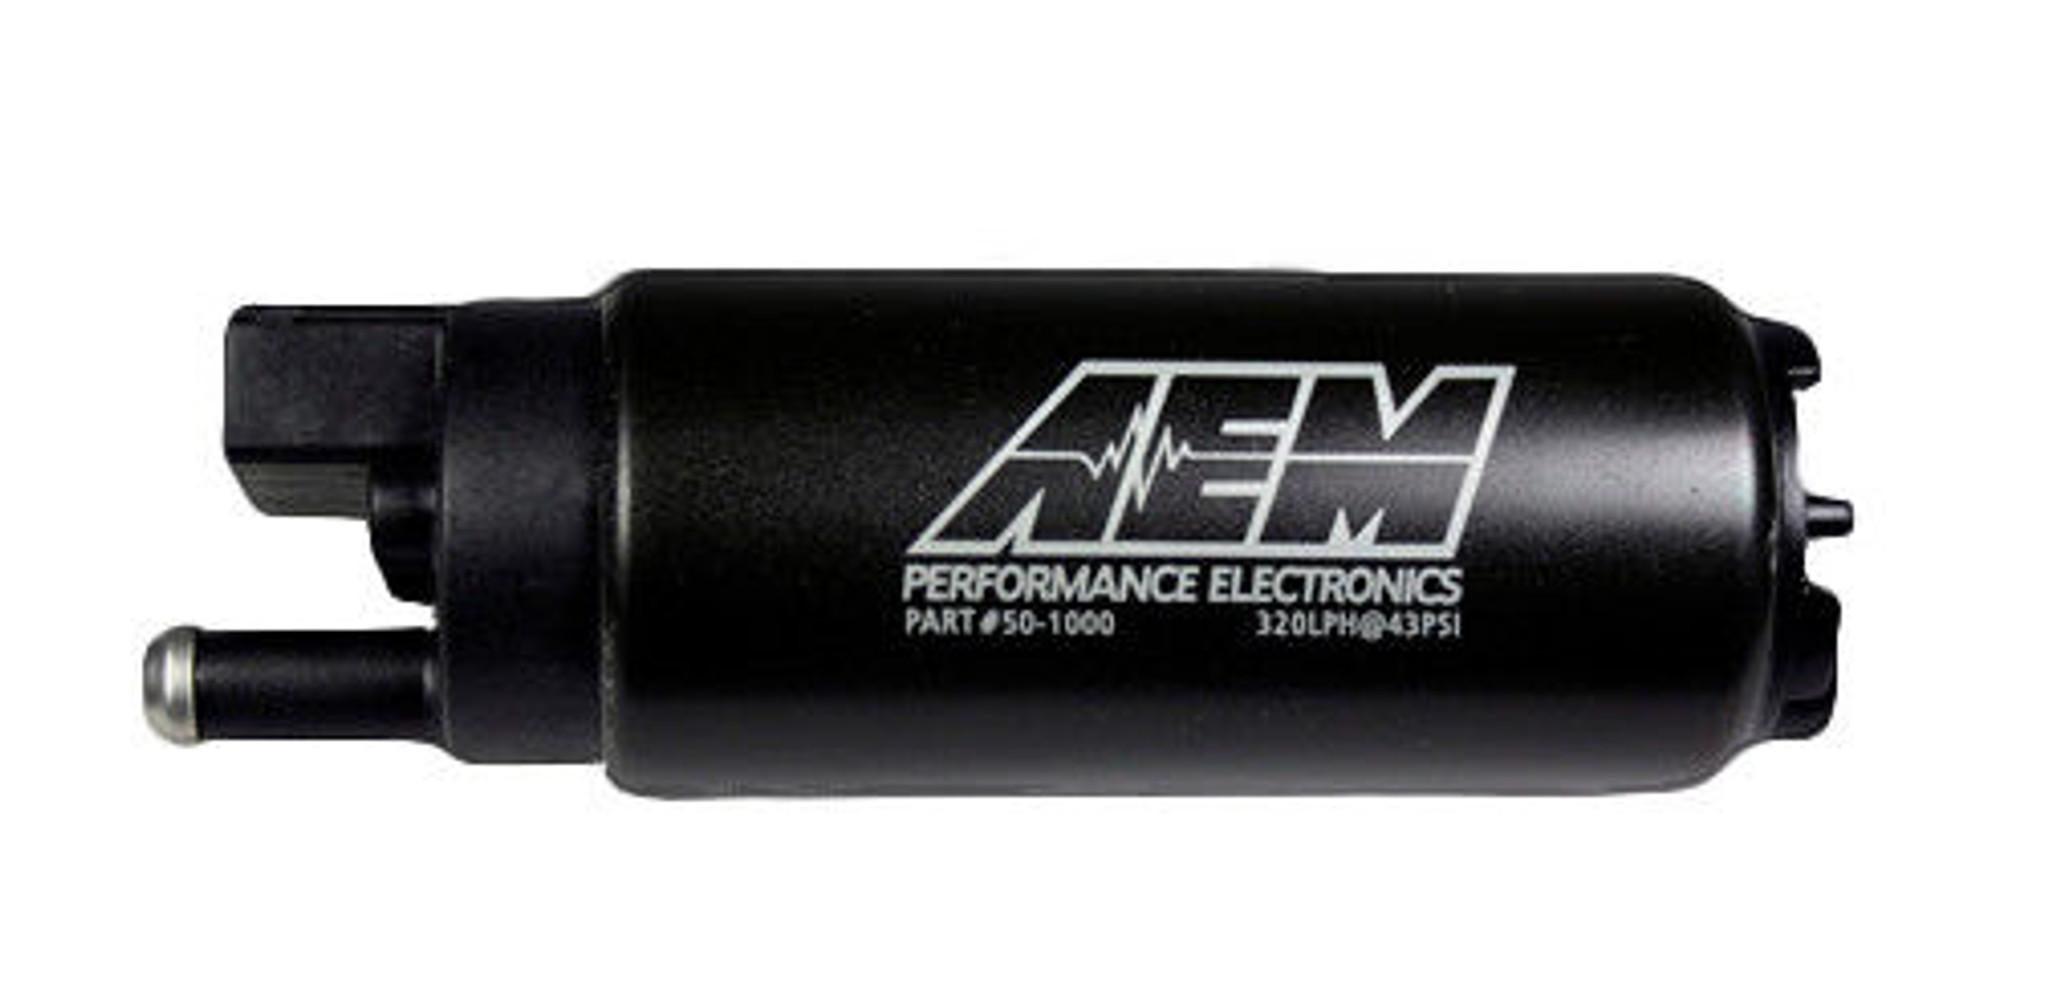 300LPH High Pressure Flow Performance In-tank Fuel Pump